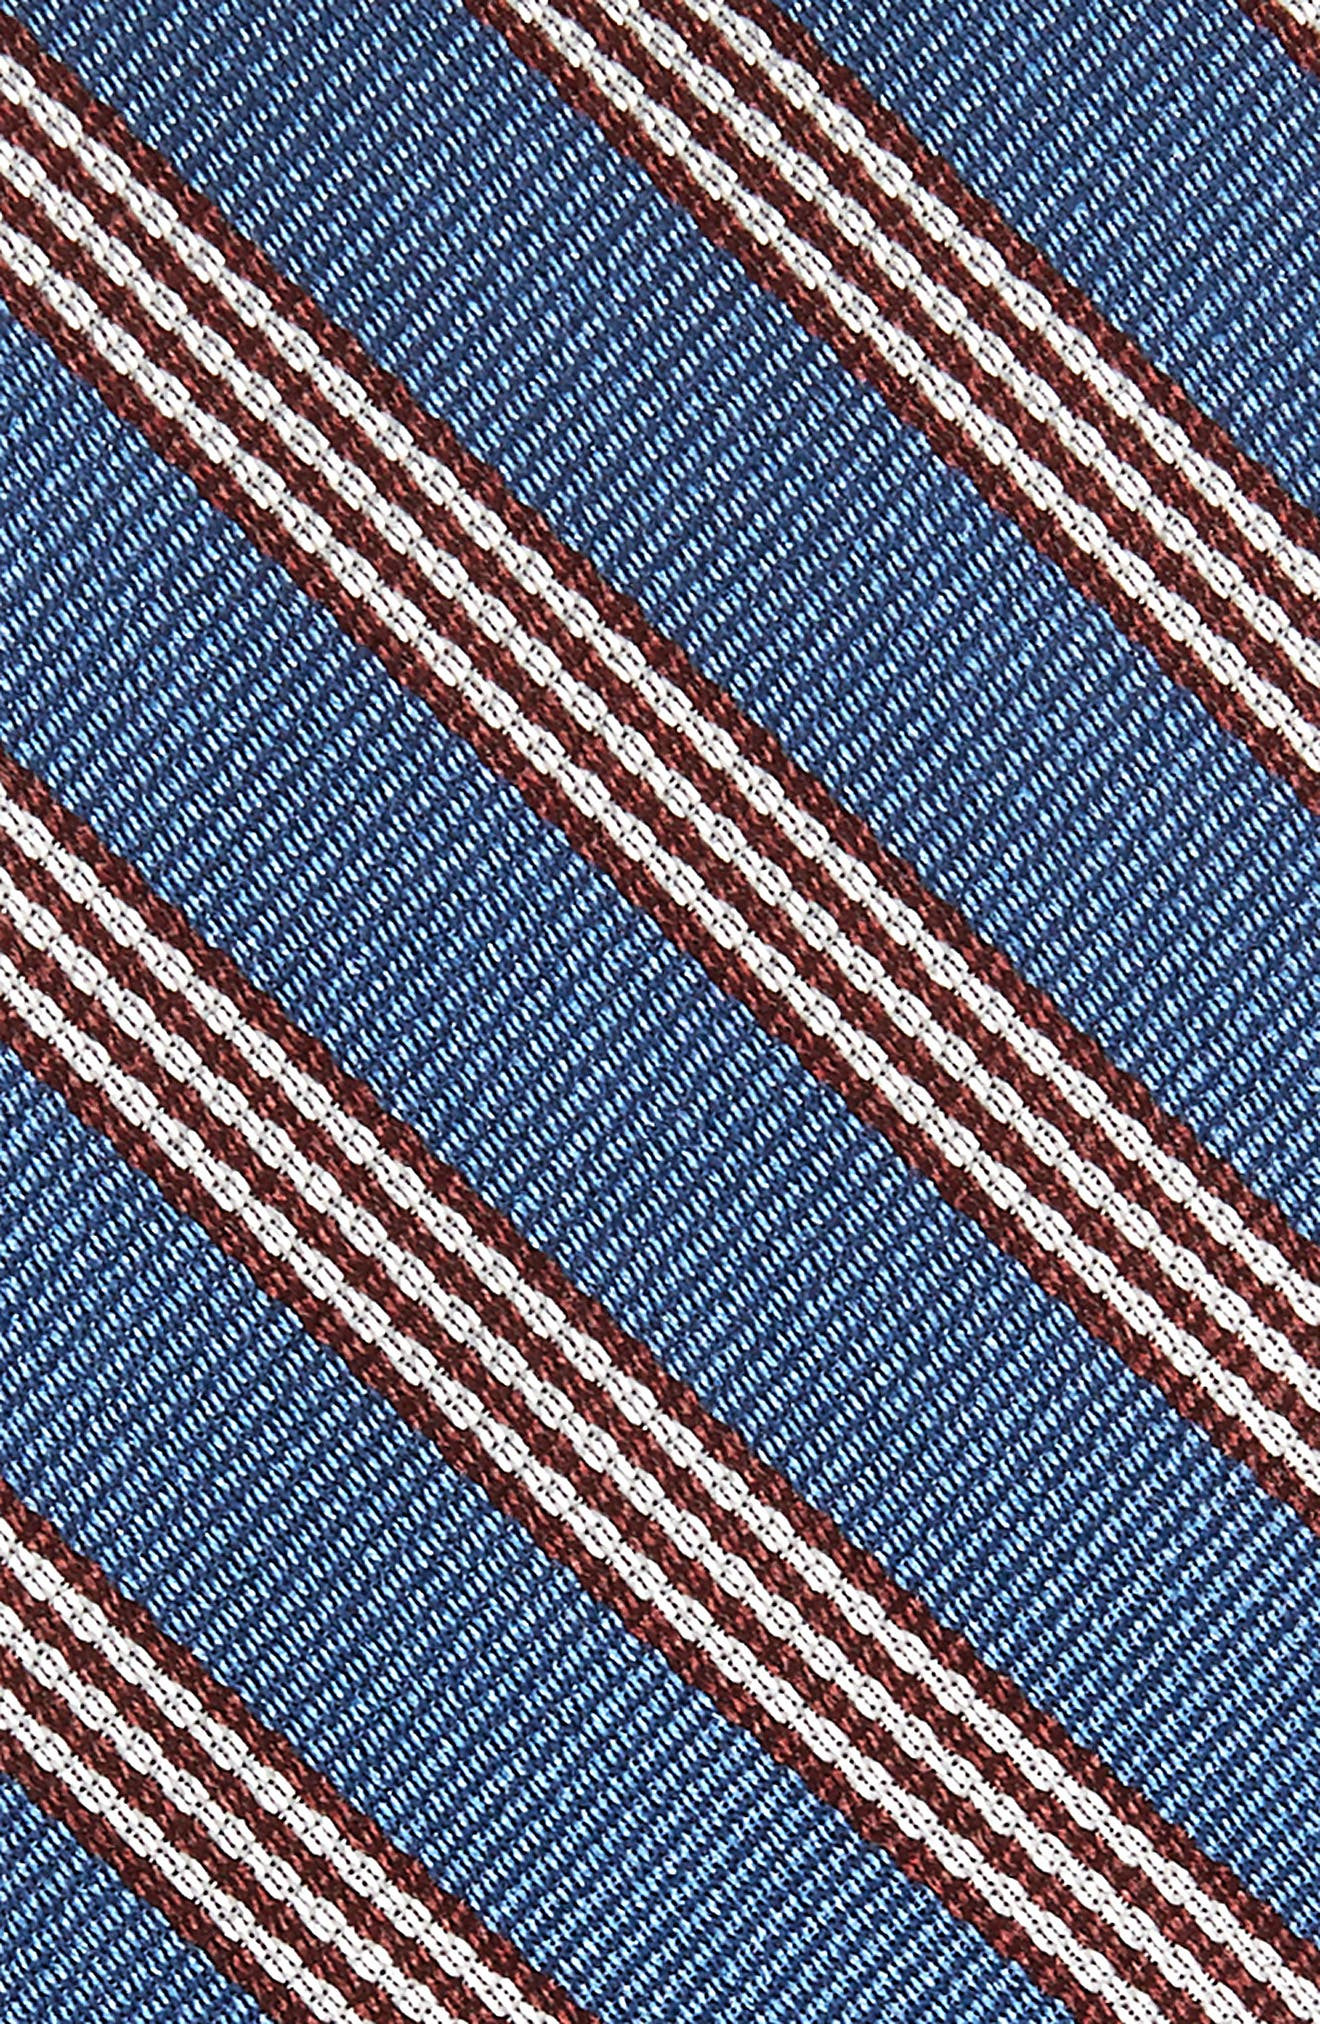 Nevis Stripe Silk Tie,                             Alternate thumbnail 2, color,                             BLUE NEVIS STRIPE